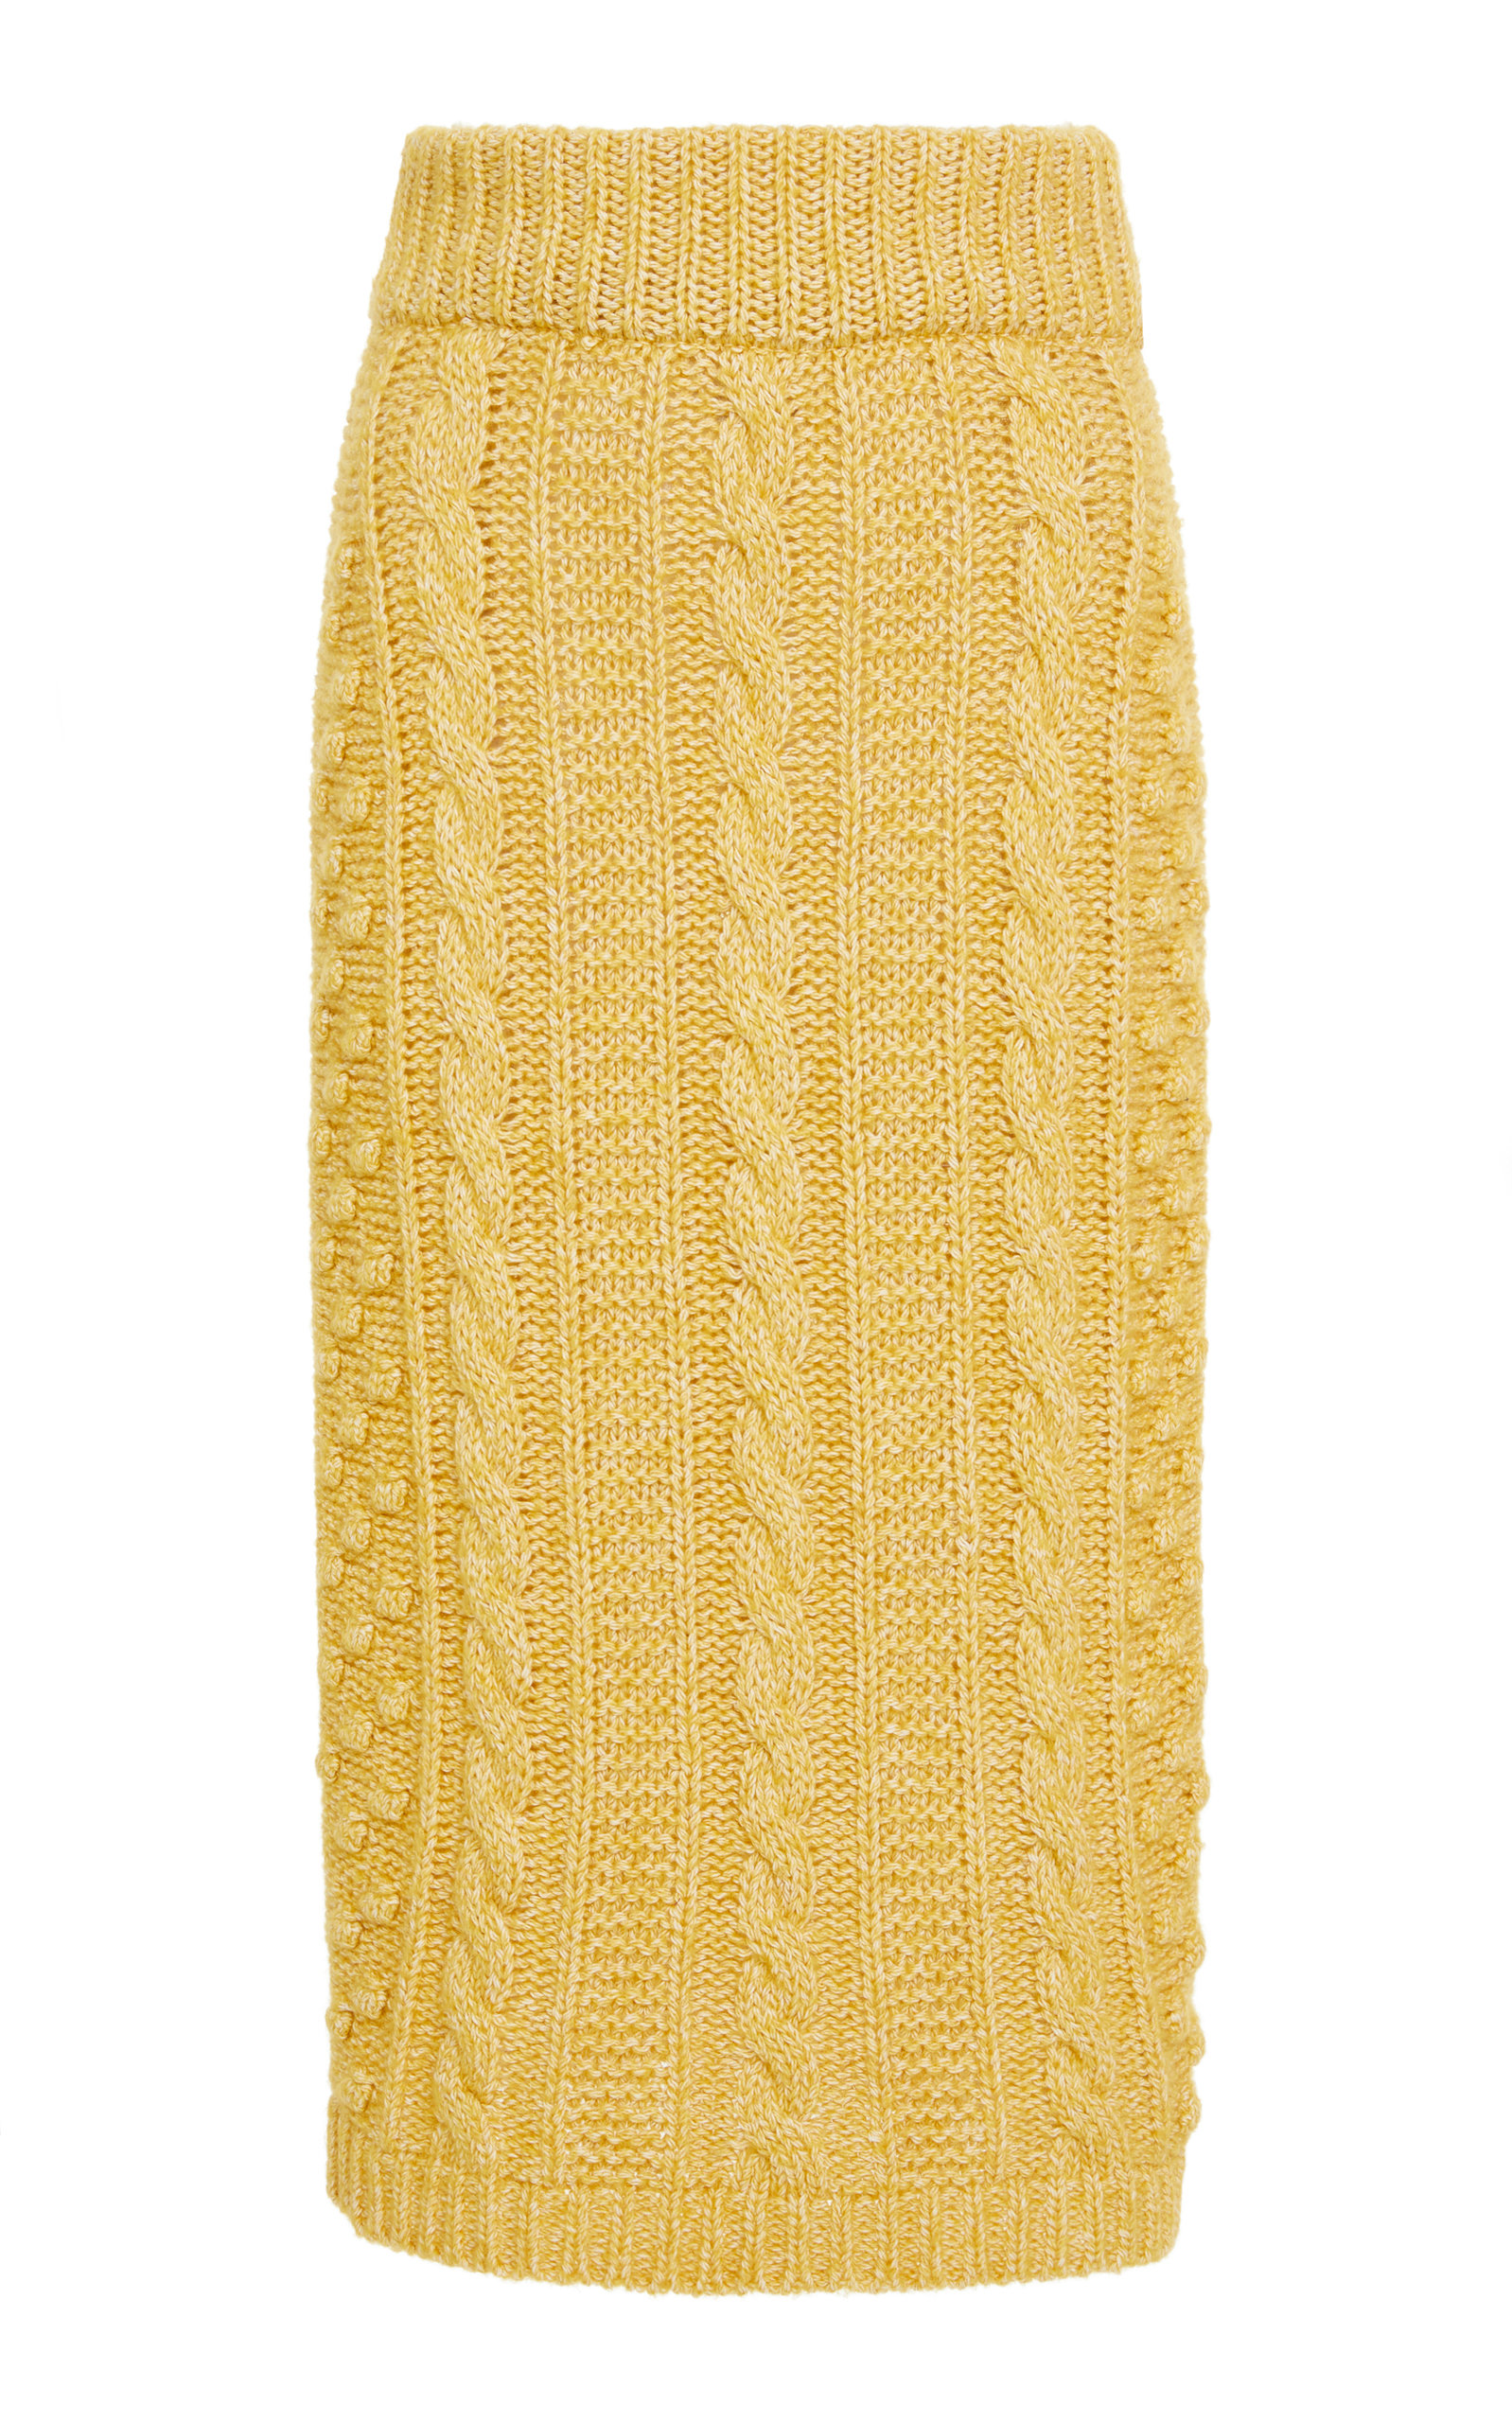 6466f0715117 ALEXA CHUNG Fashion ALEXA CHUNG CABLE-KNIT PENCIL SKIRT